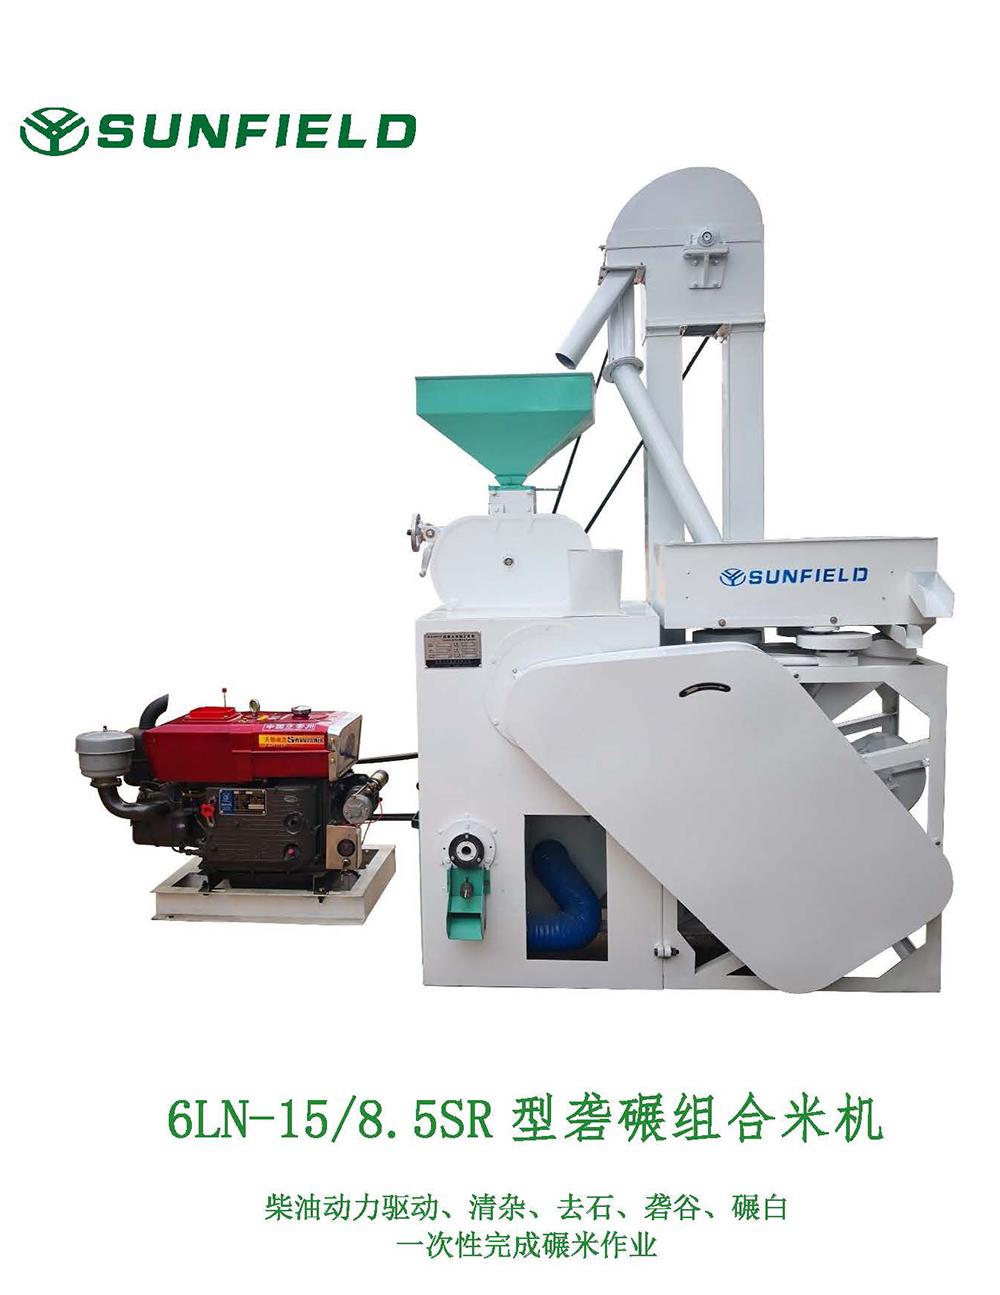 6LN-15-8.5SR礱碾組合米機-柴油機驅動-中文版_頁面_1